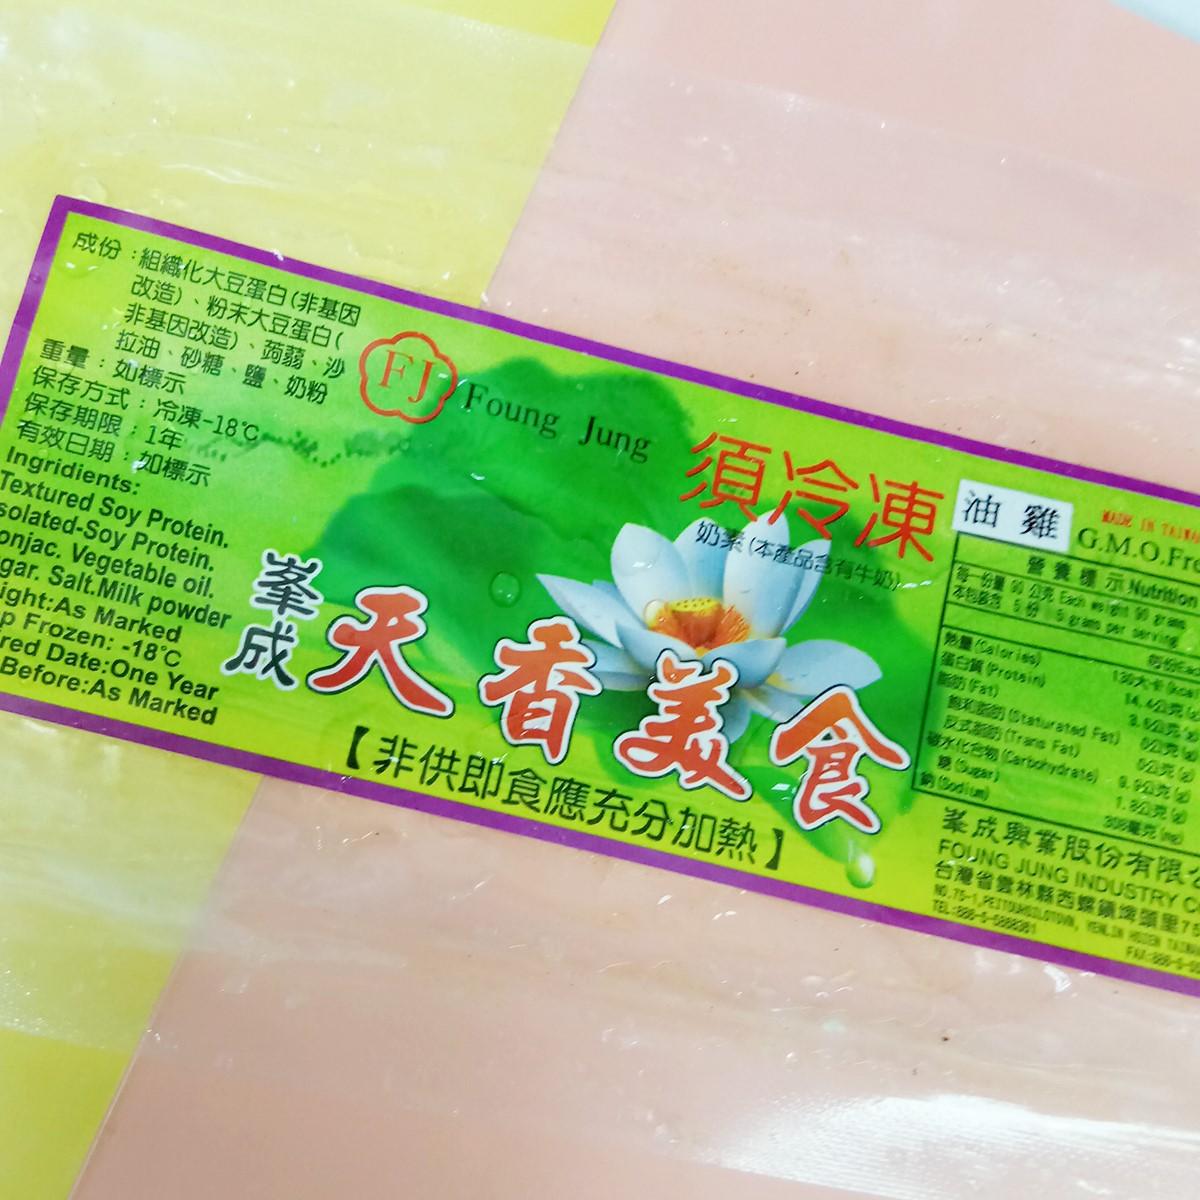 Image Oil Vege Chicken 峯成 - 油鸡 450grams